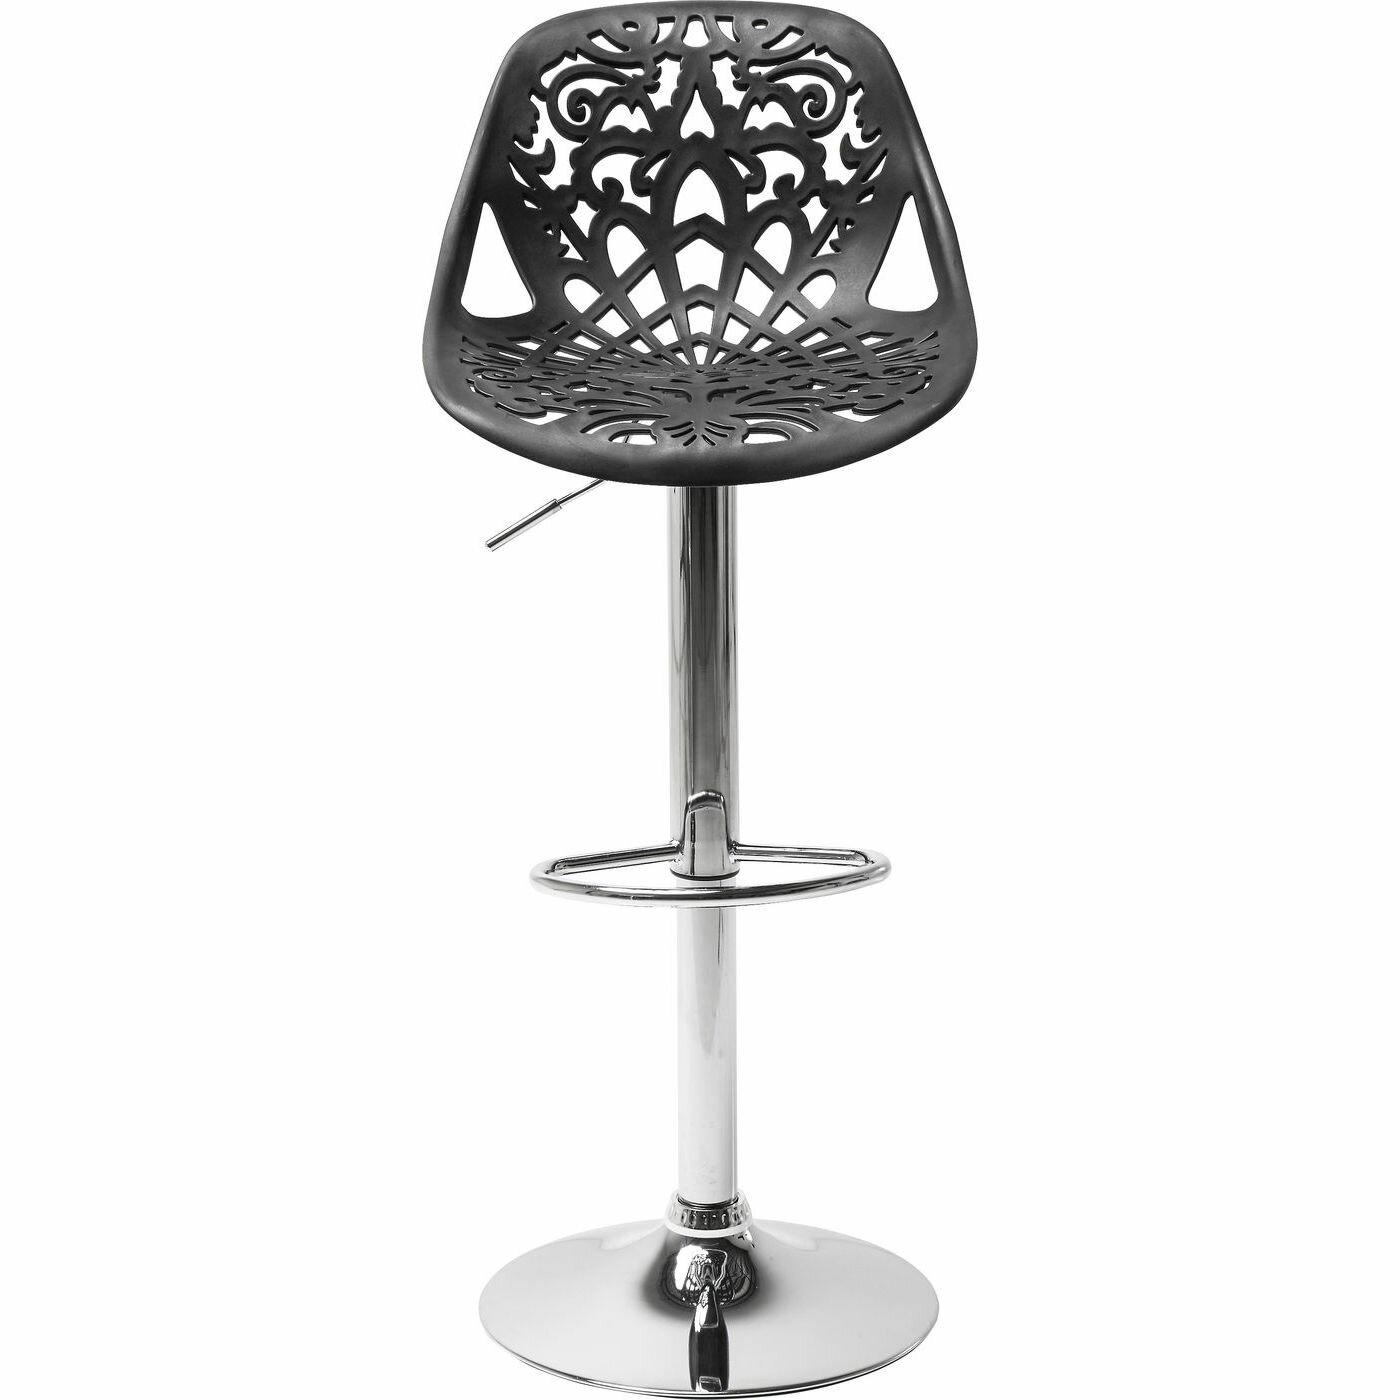 Kare design ornament adjustable bar stool reviews wayfair co uk